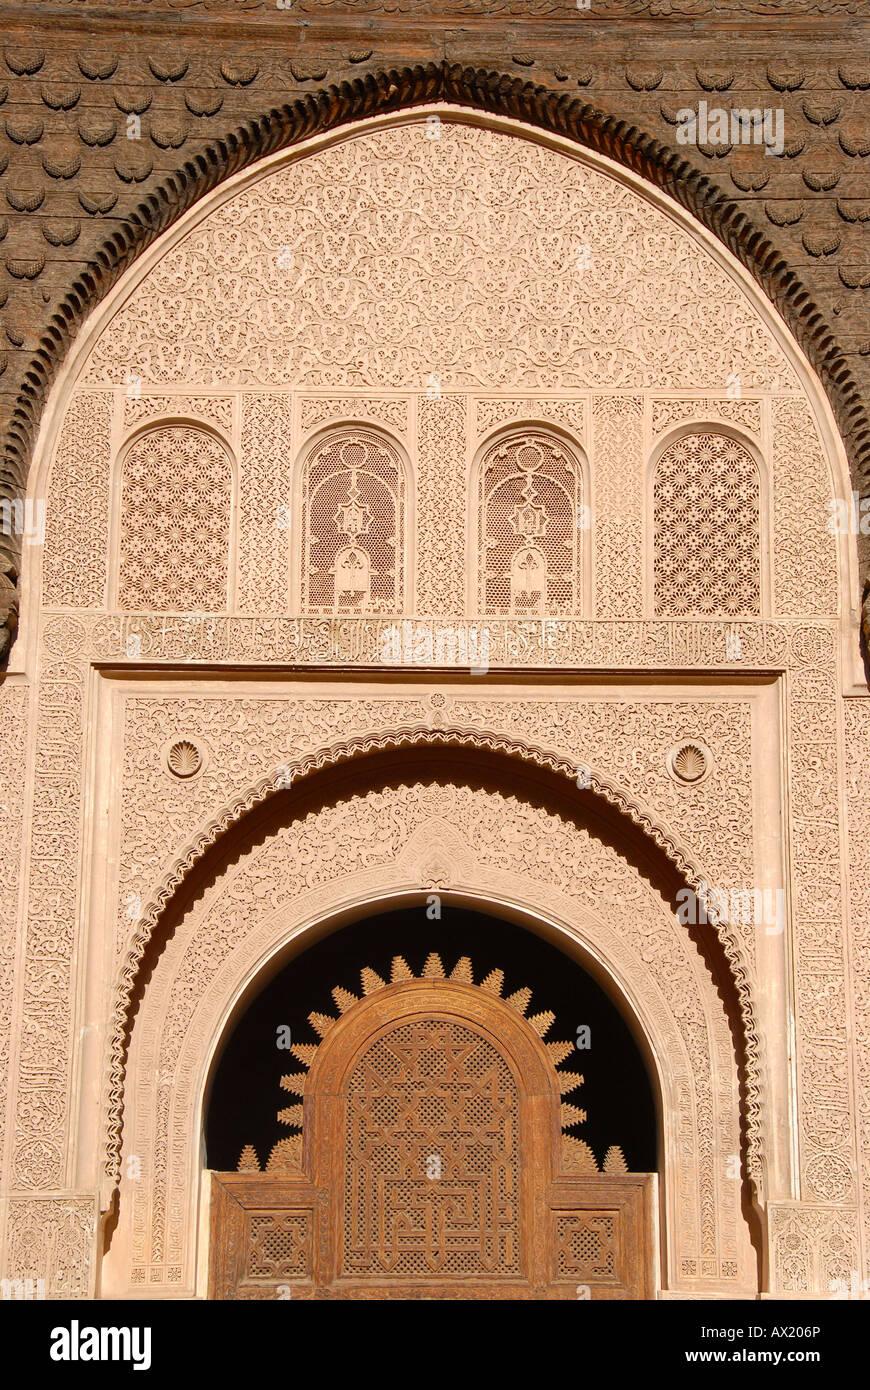 Oriental portal made of cedar wood with fine stucco richly decorated Medersa Ali Ben Youssef medina Marrakech Morocco Stock Photo